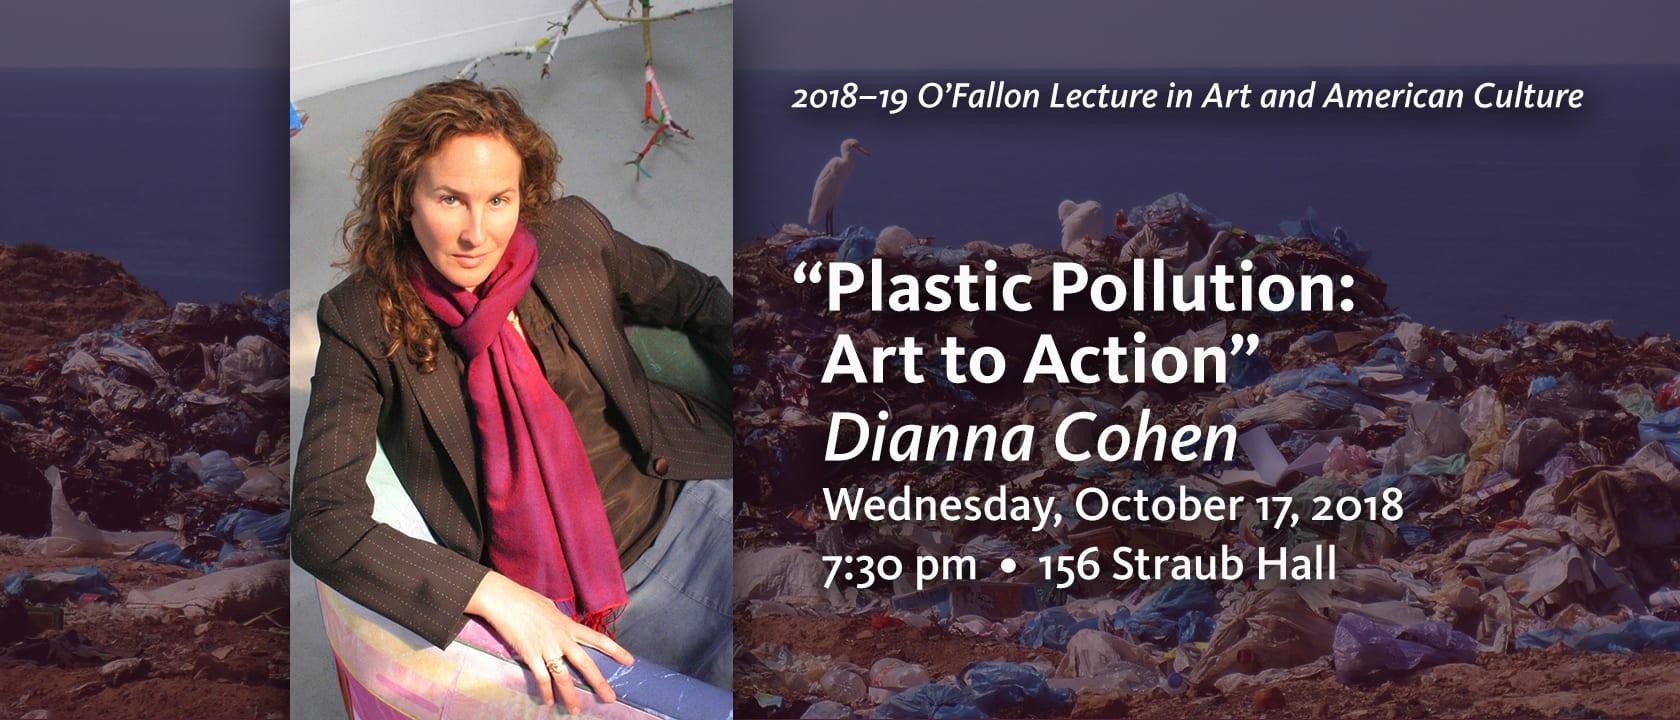 Permalink to:Dianna Cohen—October 17, 2018